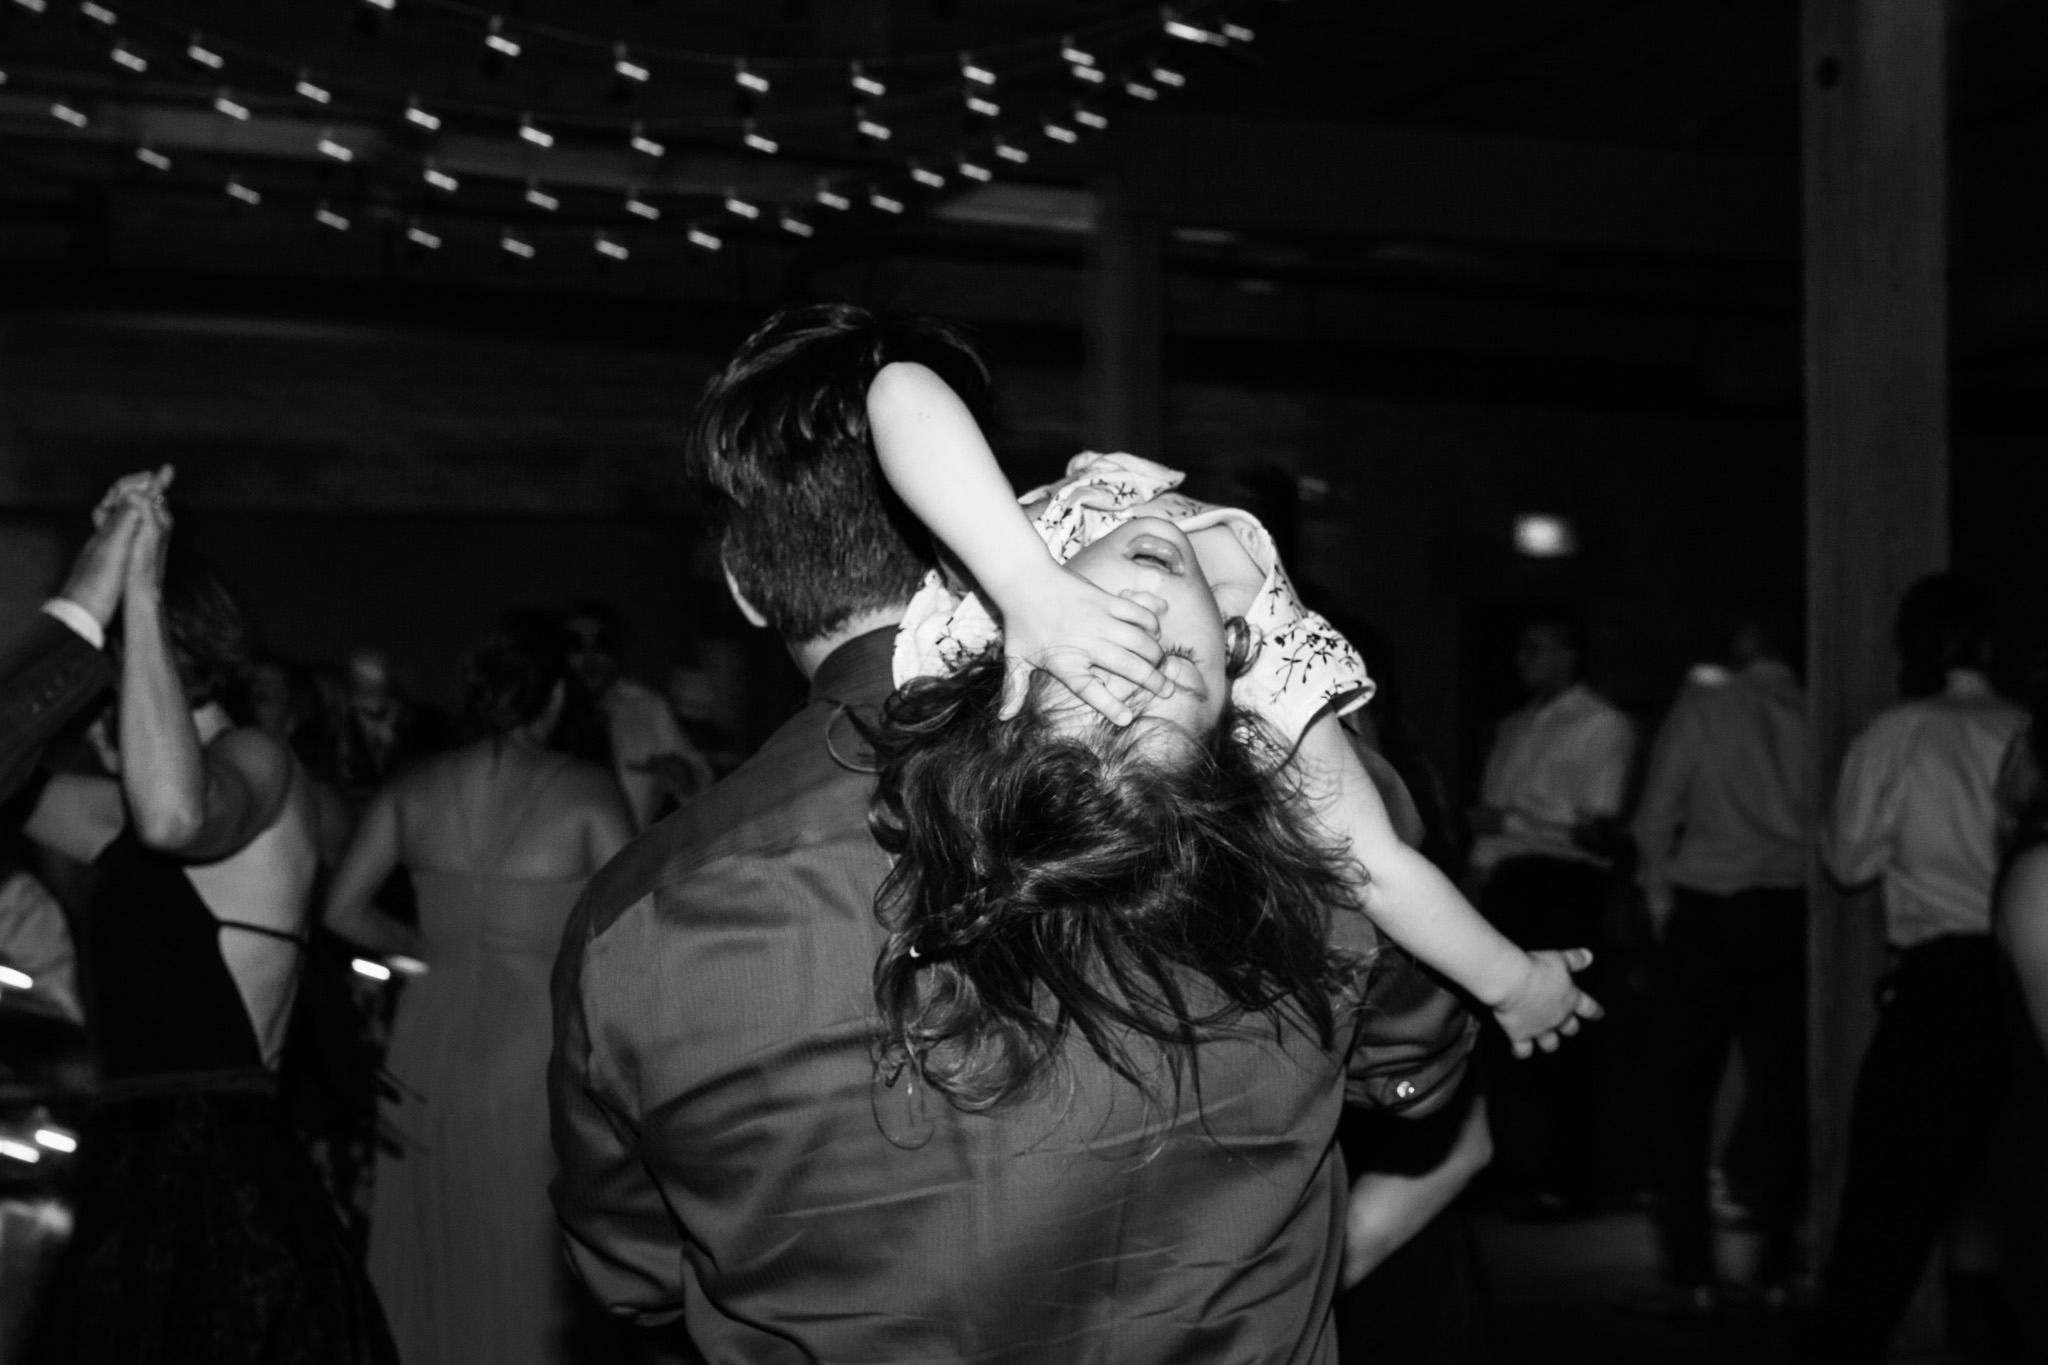 bridgeport-art-center-wedding-photos-47.jpg